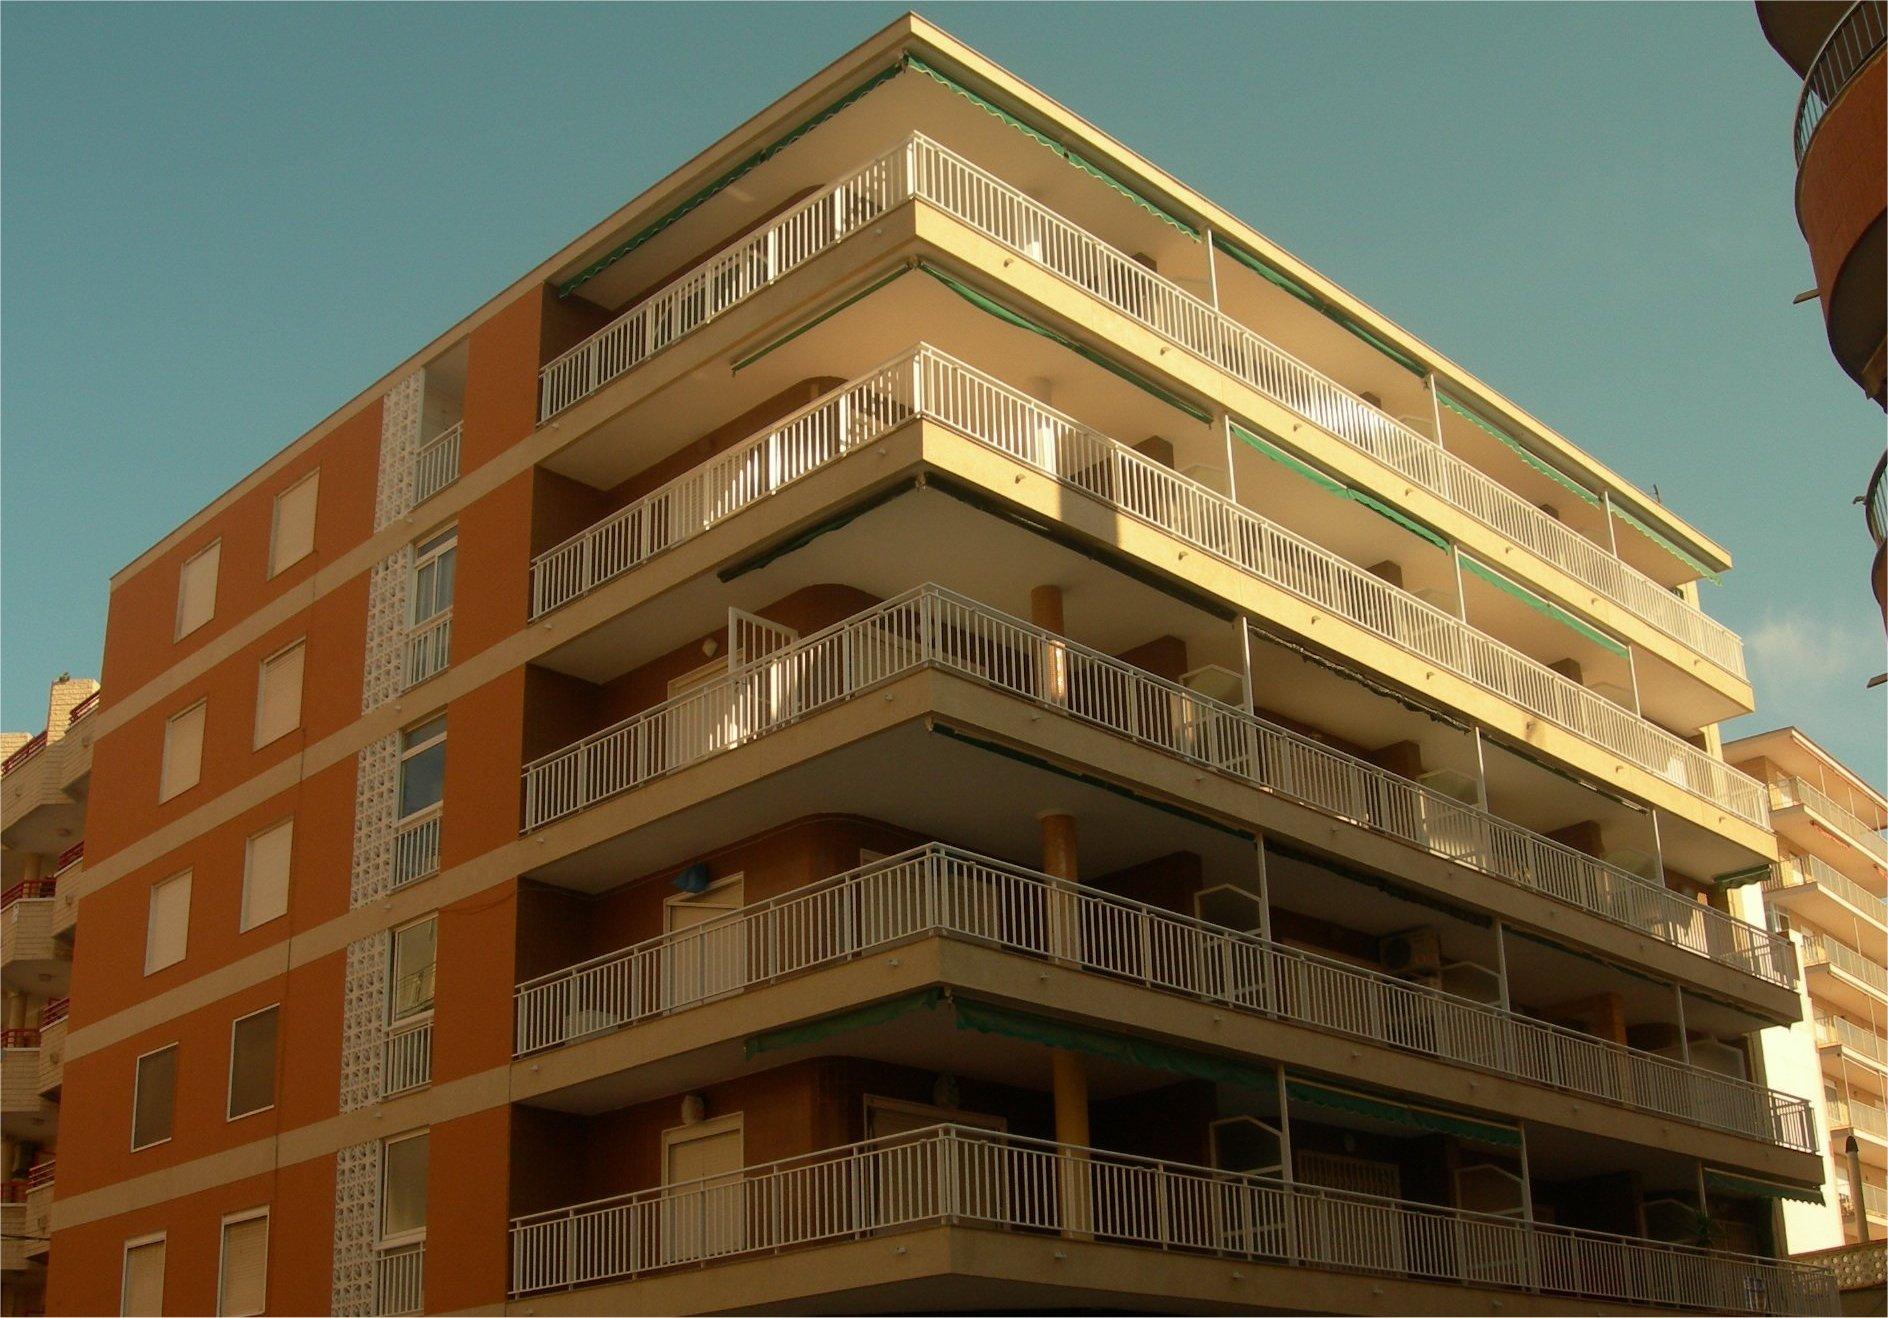 rehabilitacion de fachada en torrevieja orihuela guardamar del segura (2)